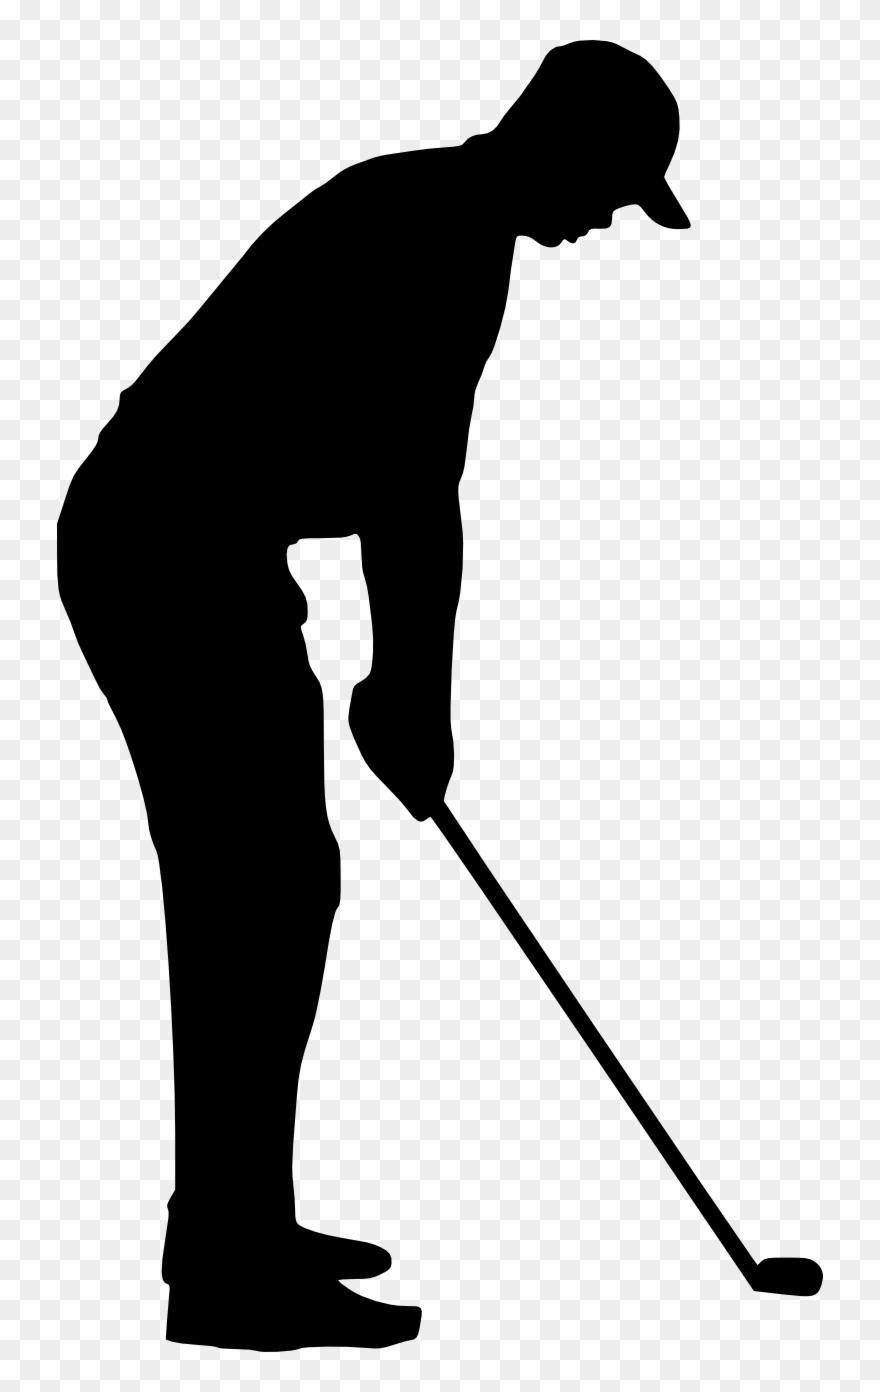 Golfing retro sport . Golf clipart transparent background